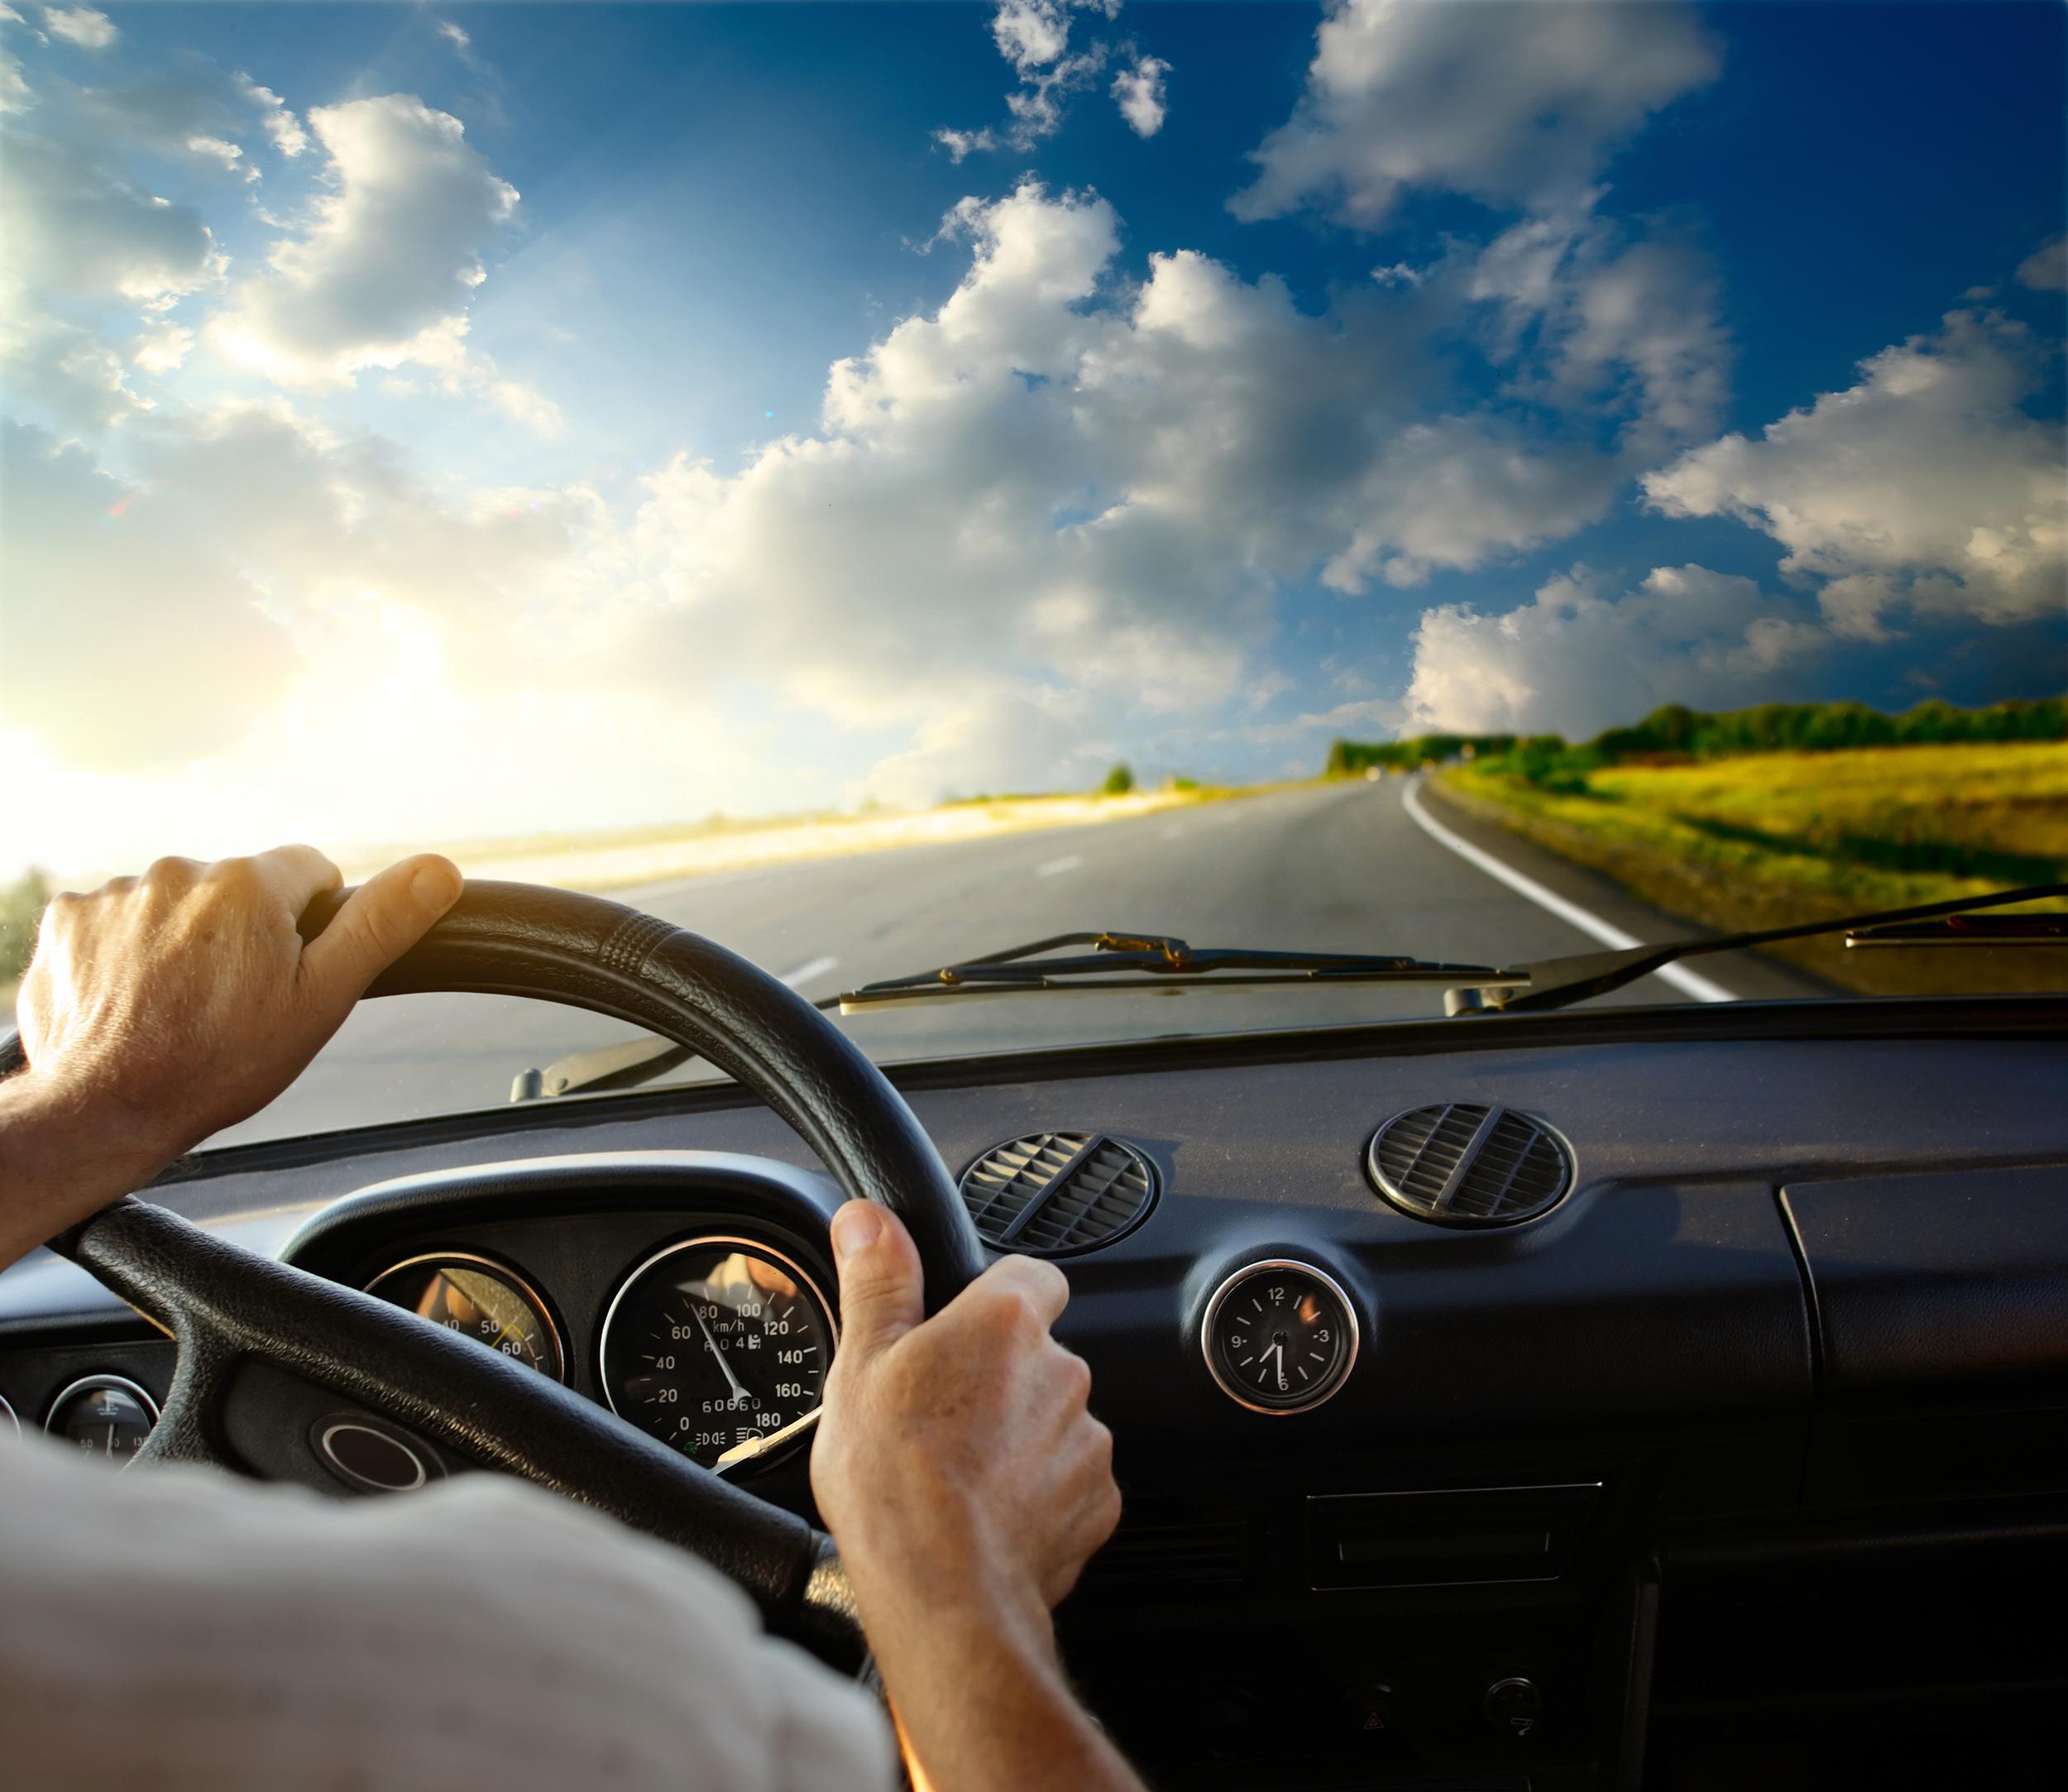 driving shutterstock_90110512.jpg